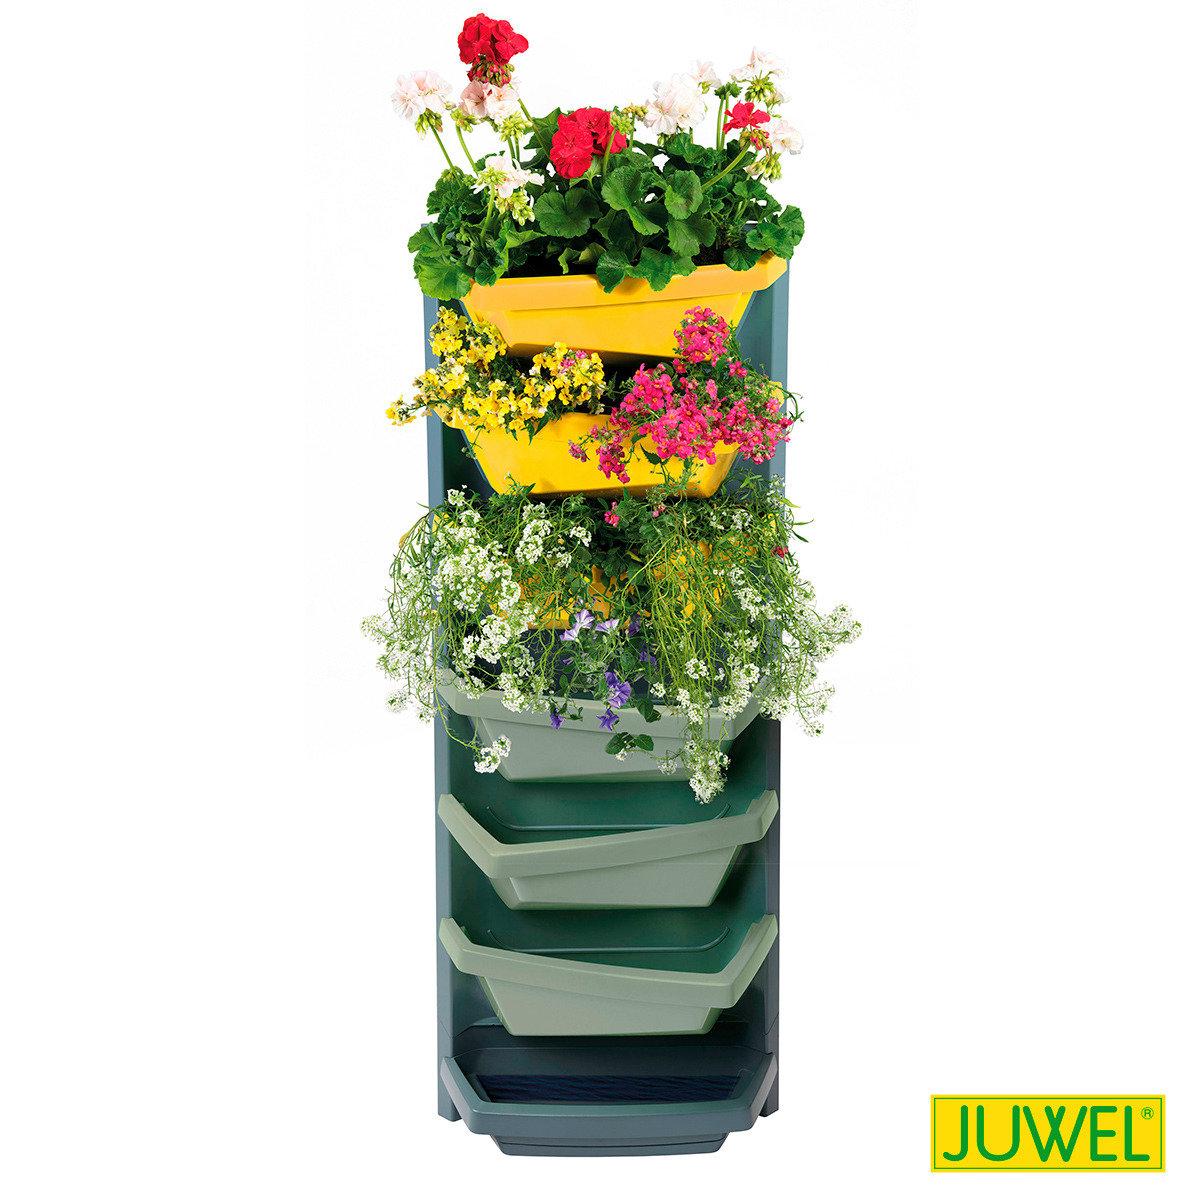 JUWEL Vertical Garden Aufbauelement, safran